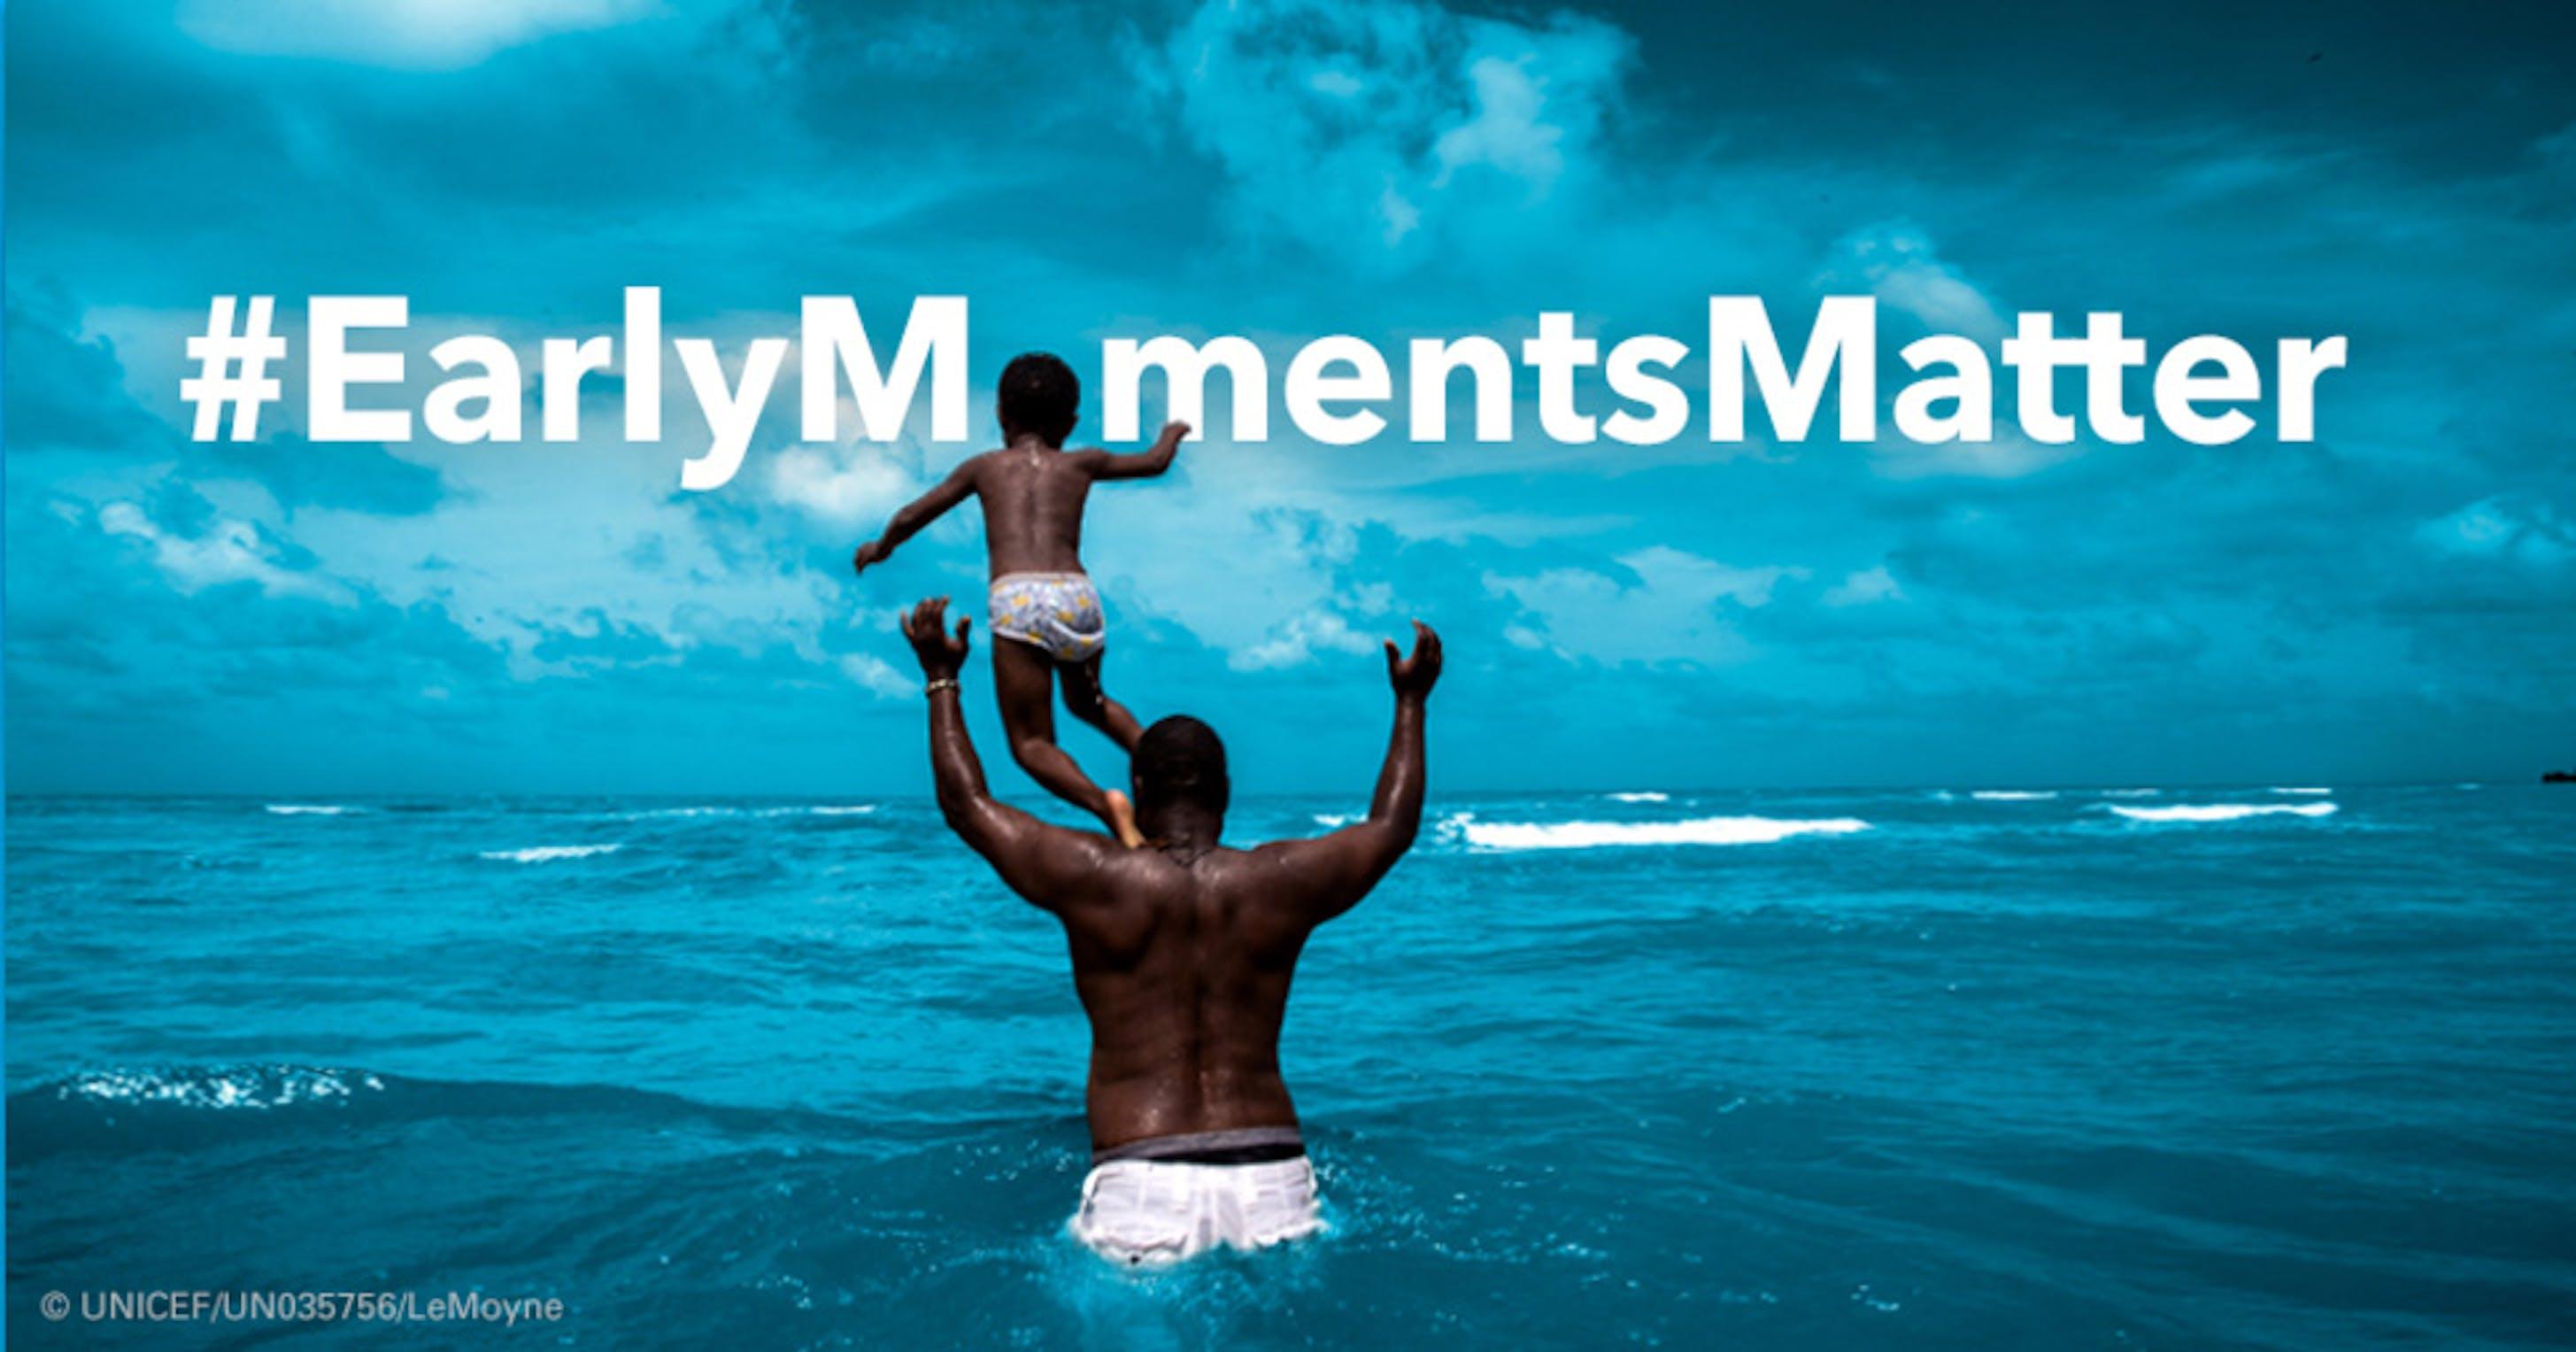 #EarlyMomentsMatter